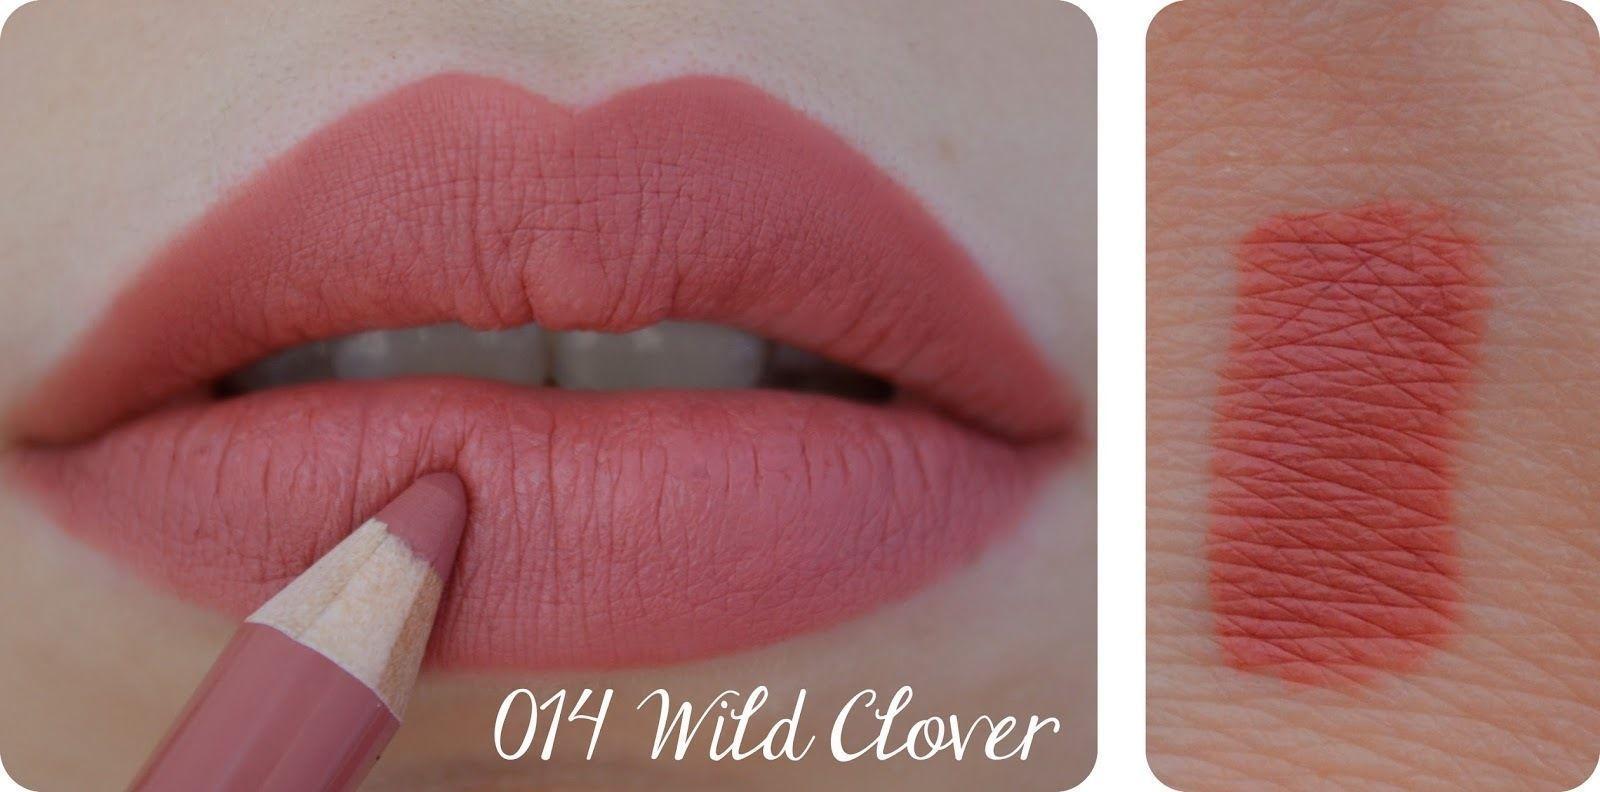 Rimmel London 1000 Kisses Lip Linear Pencil Lasting Wild Clover